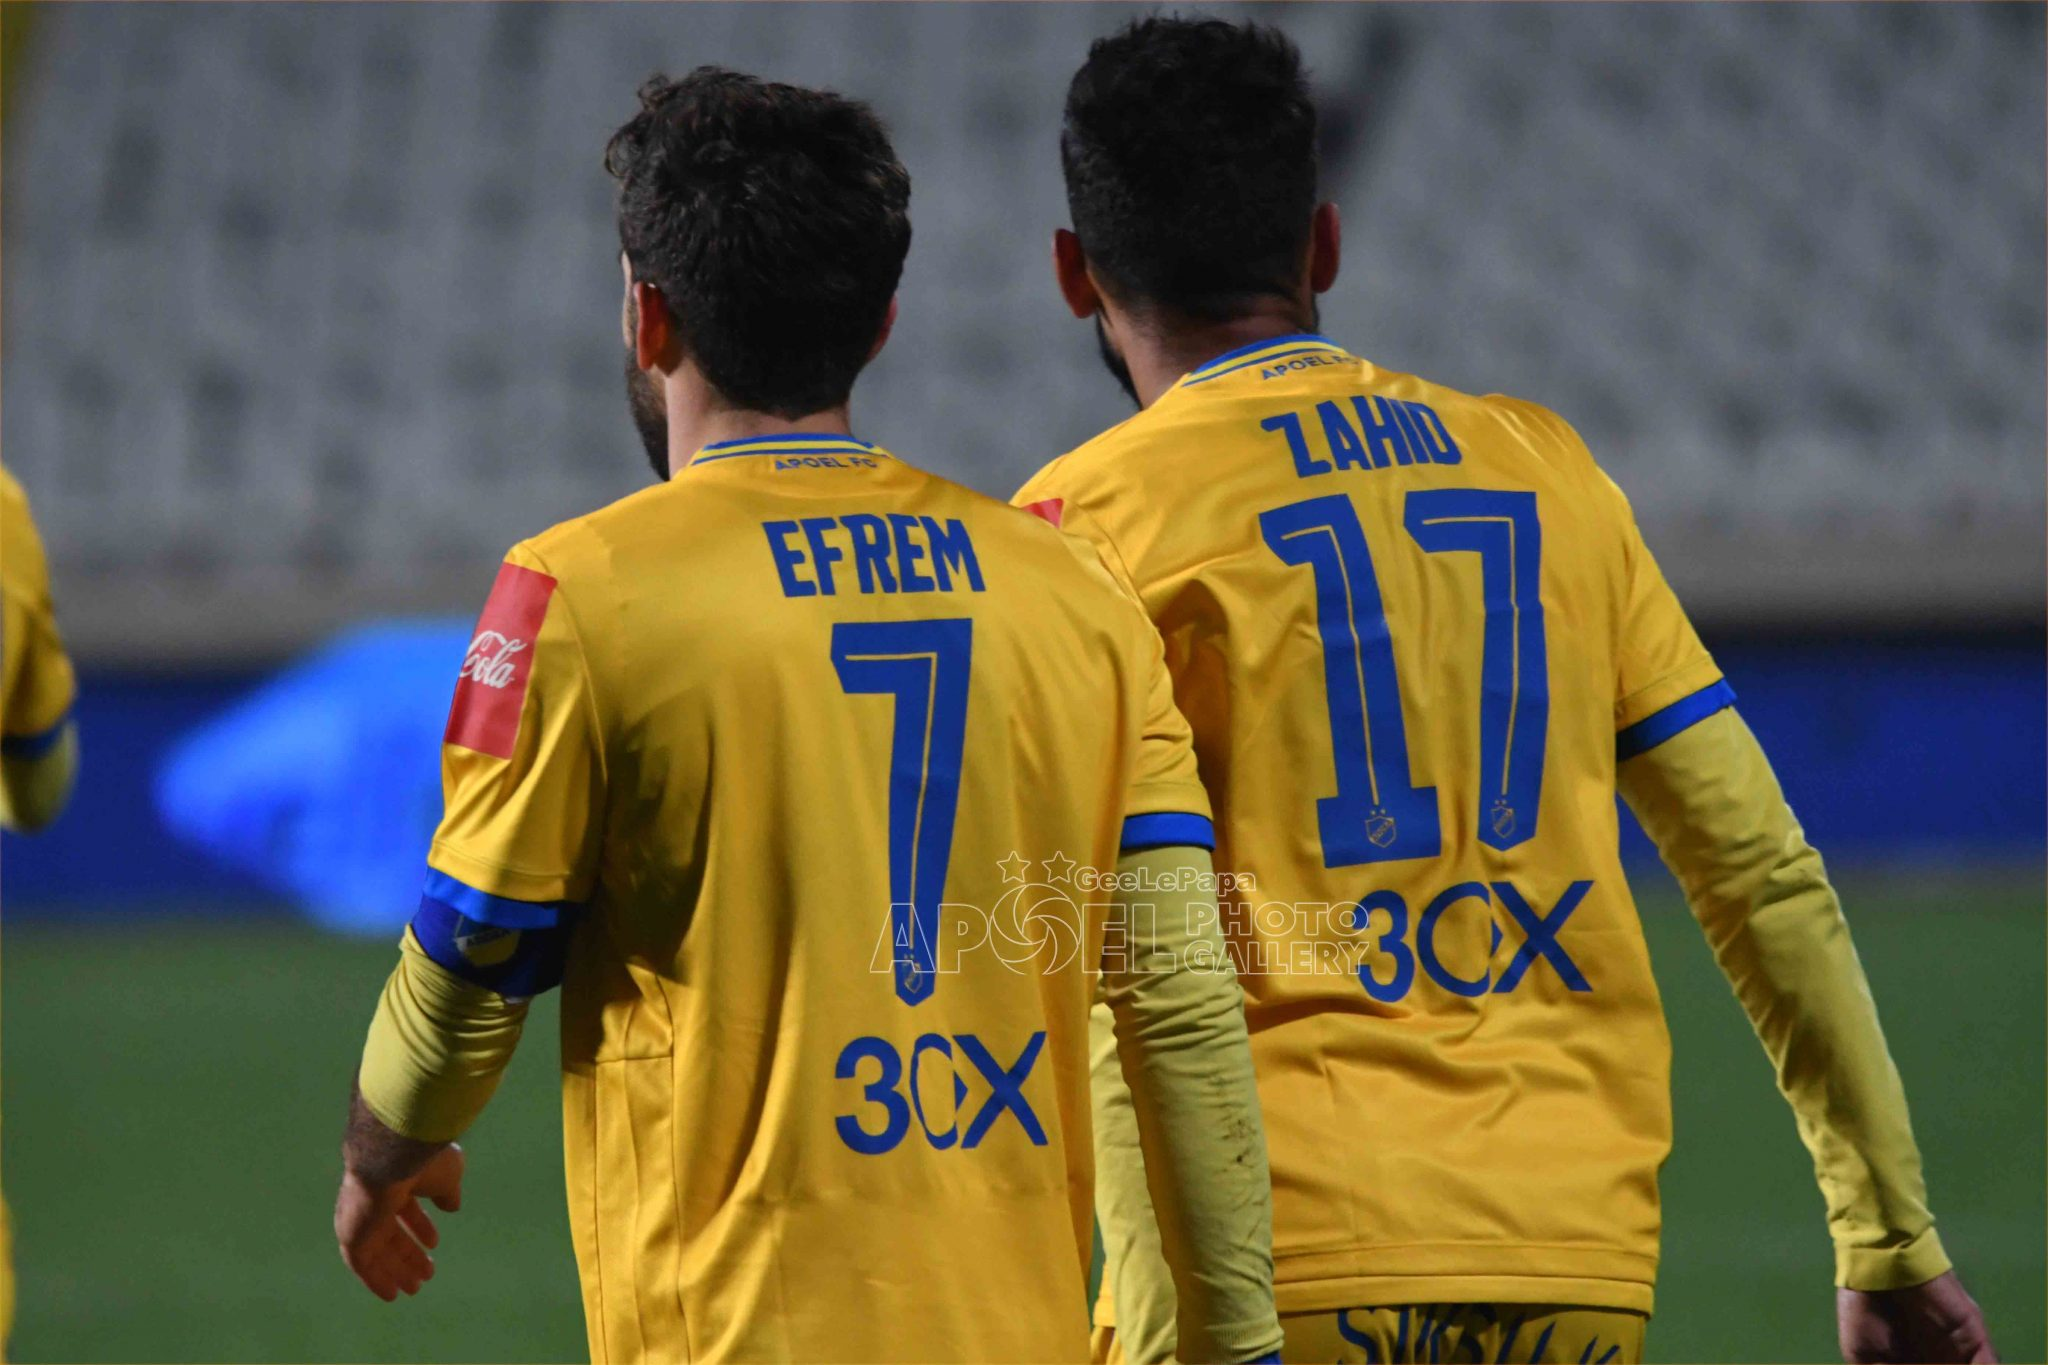 APOEL FC 2 vs APOLLON 1